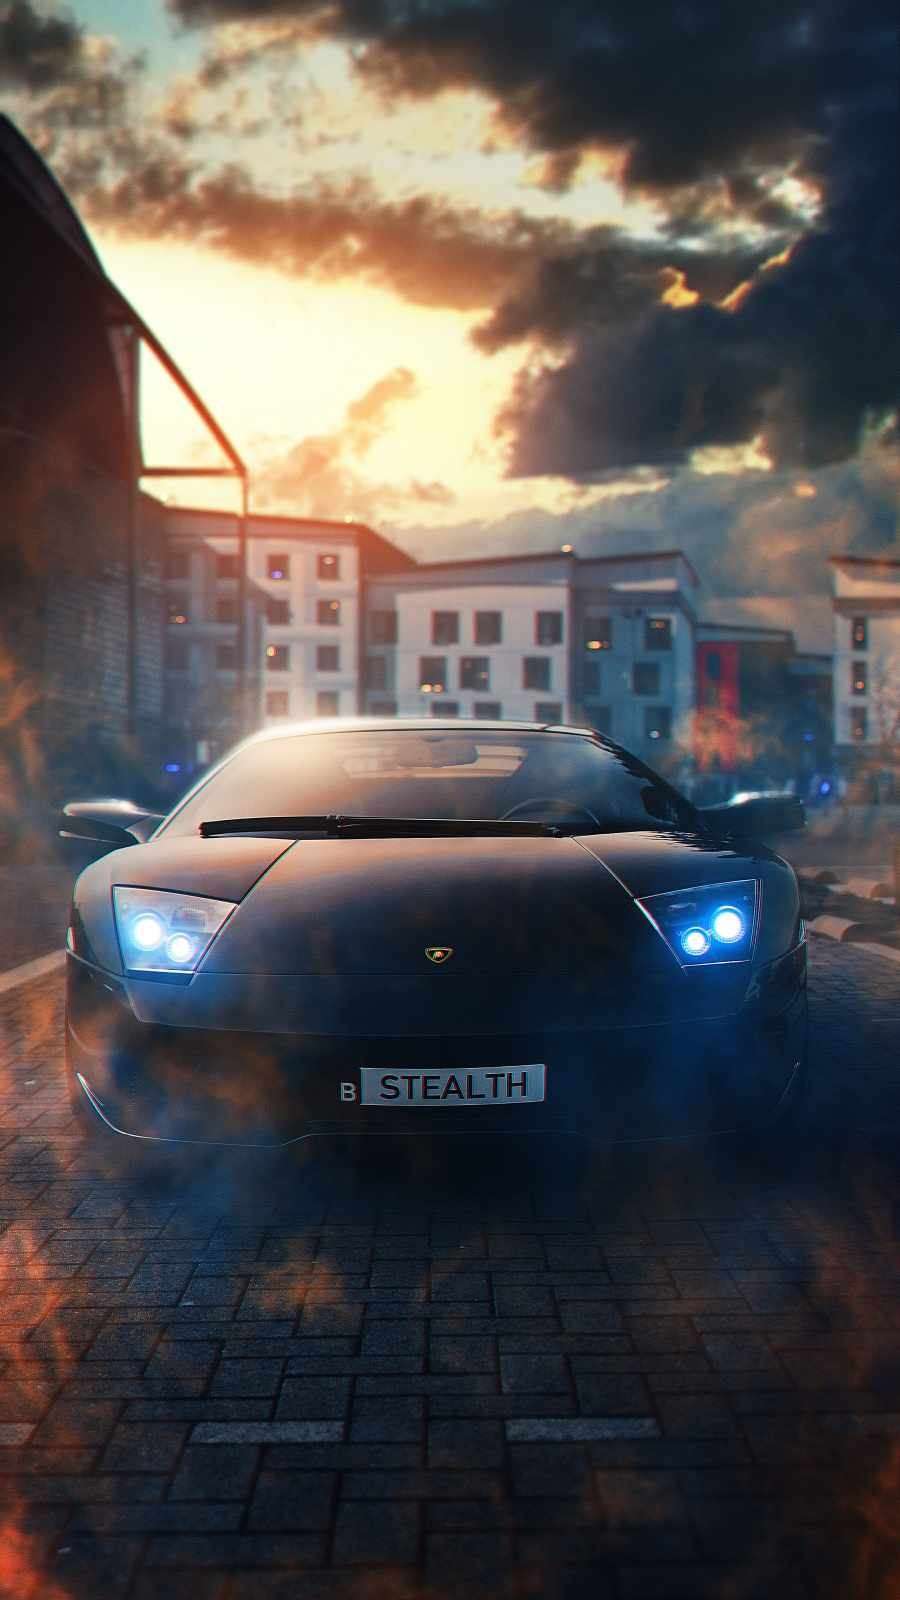 Stealth Lamborghini